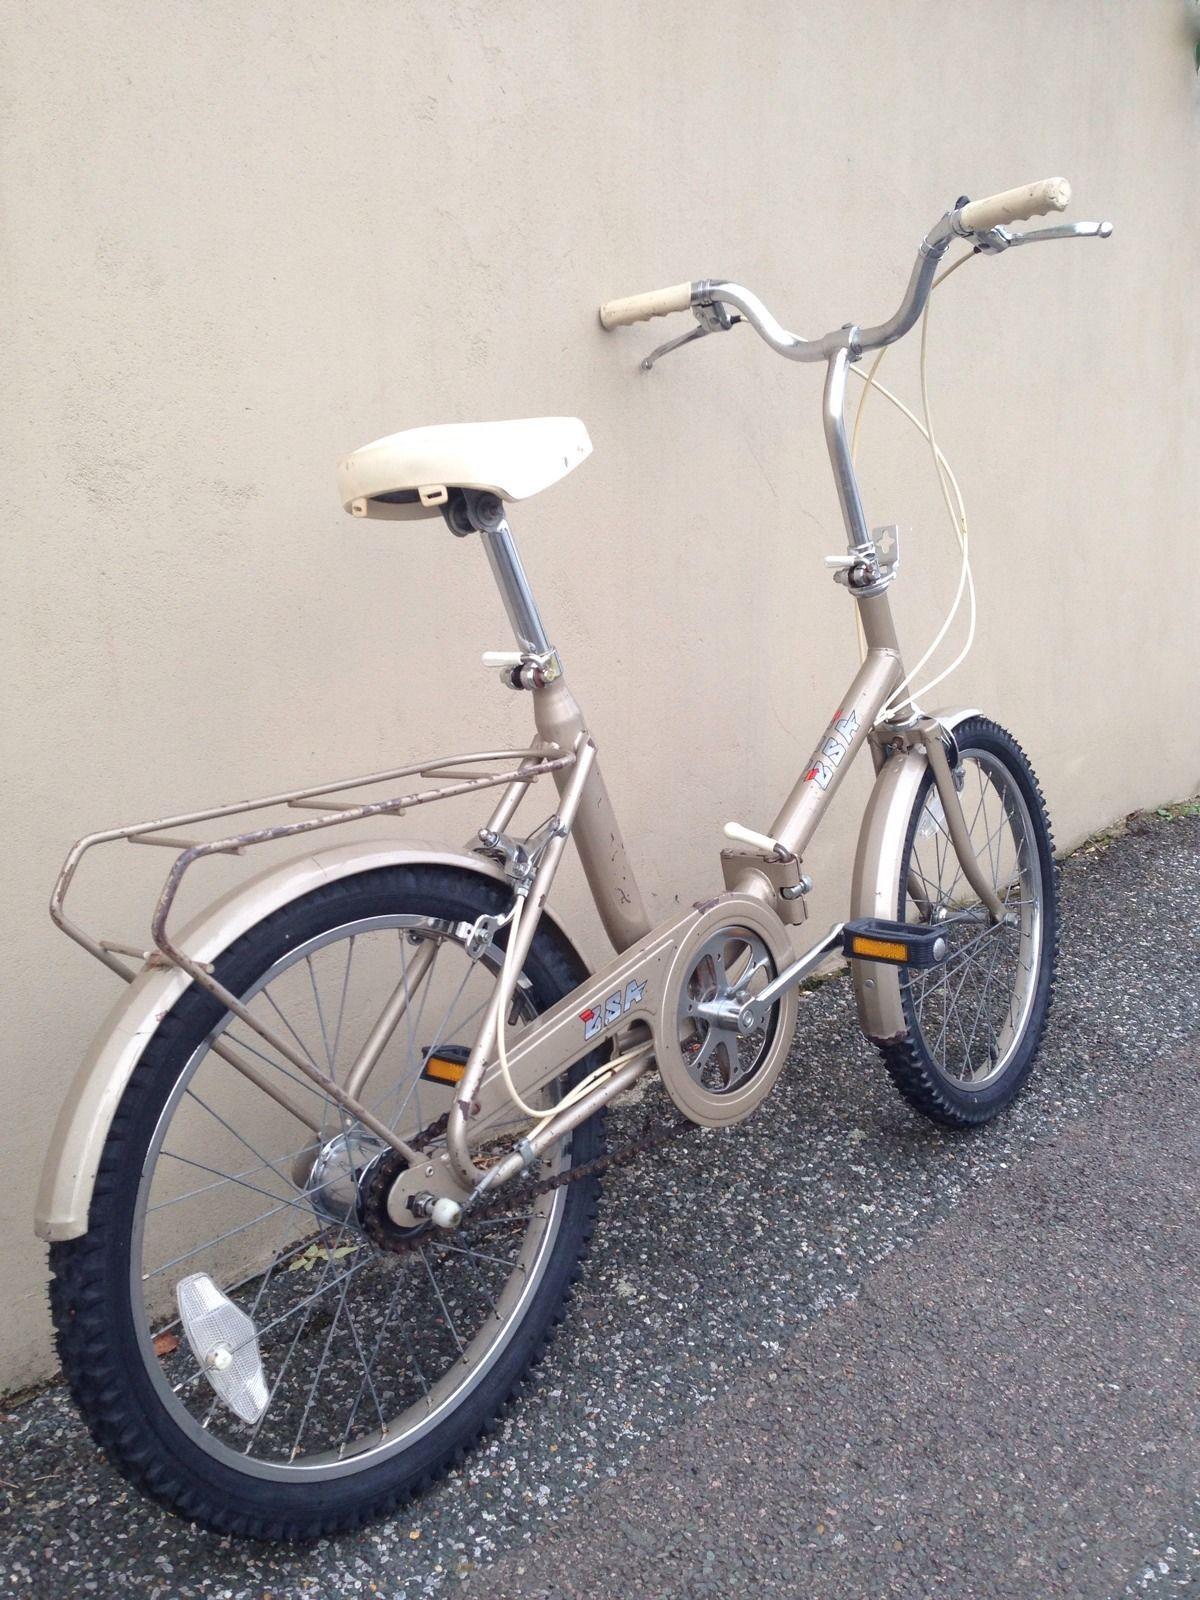 Vintage Bsa Folding Fold Up Folder Bicycle Bike Cycle